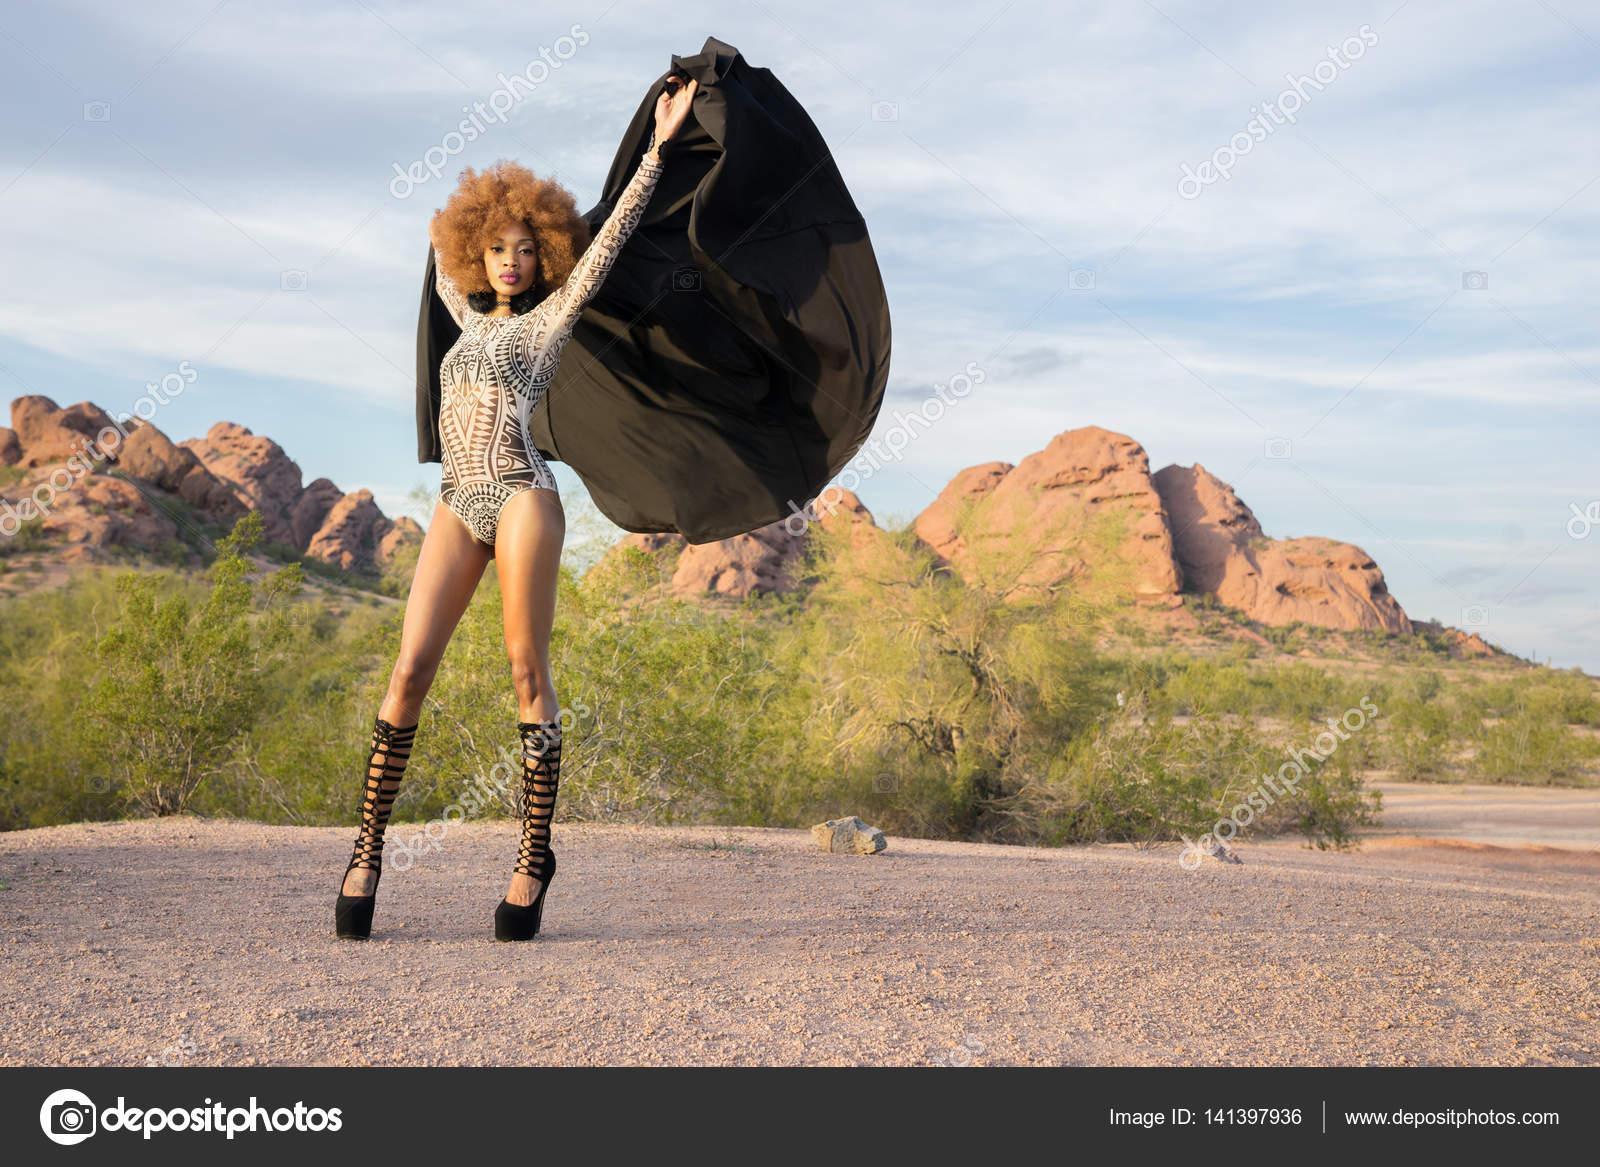 Mode stijl shoot met prachtige afrikaanse amerikaanse model dragen